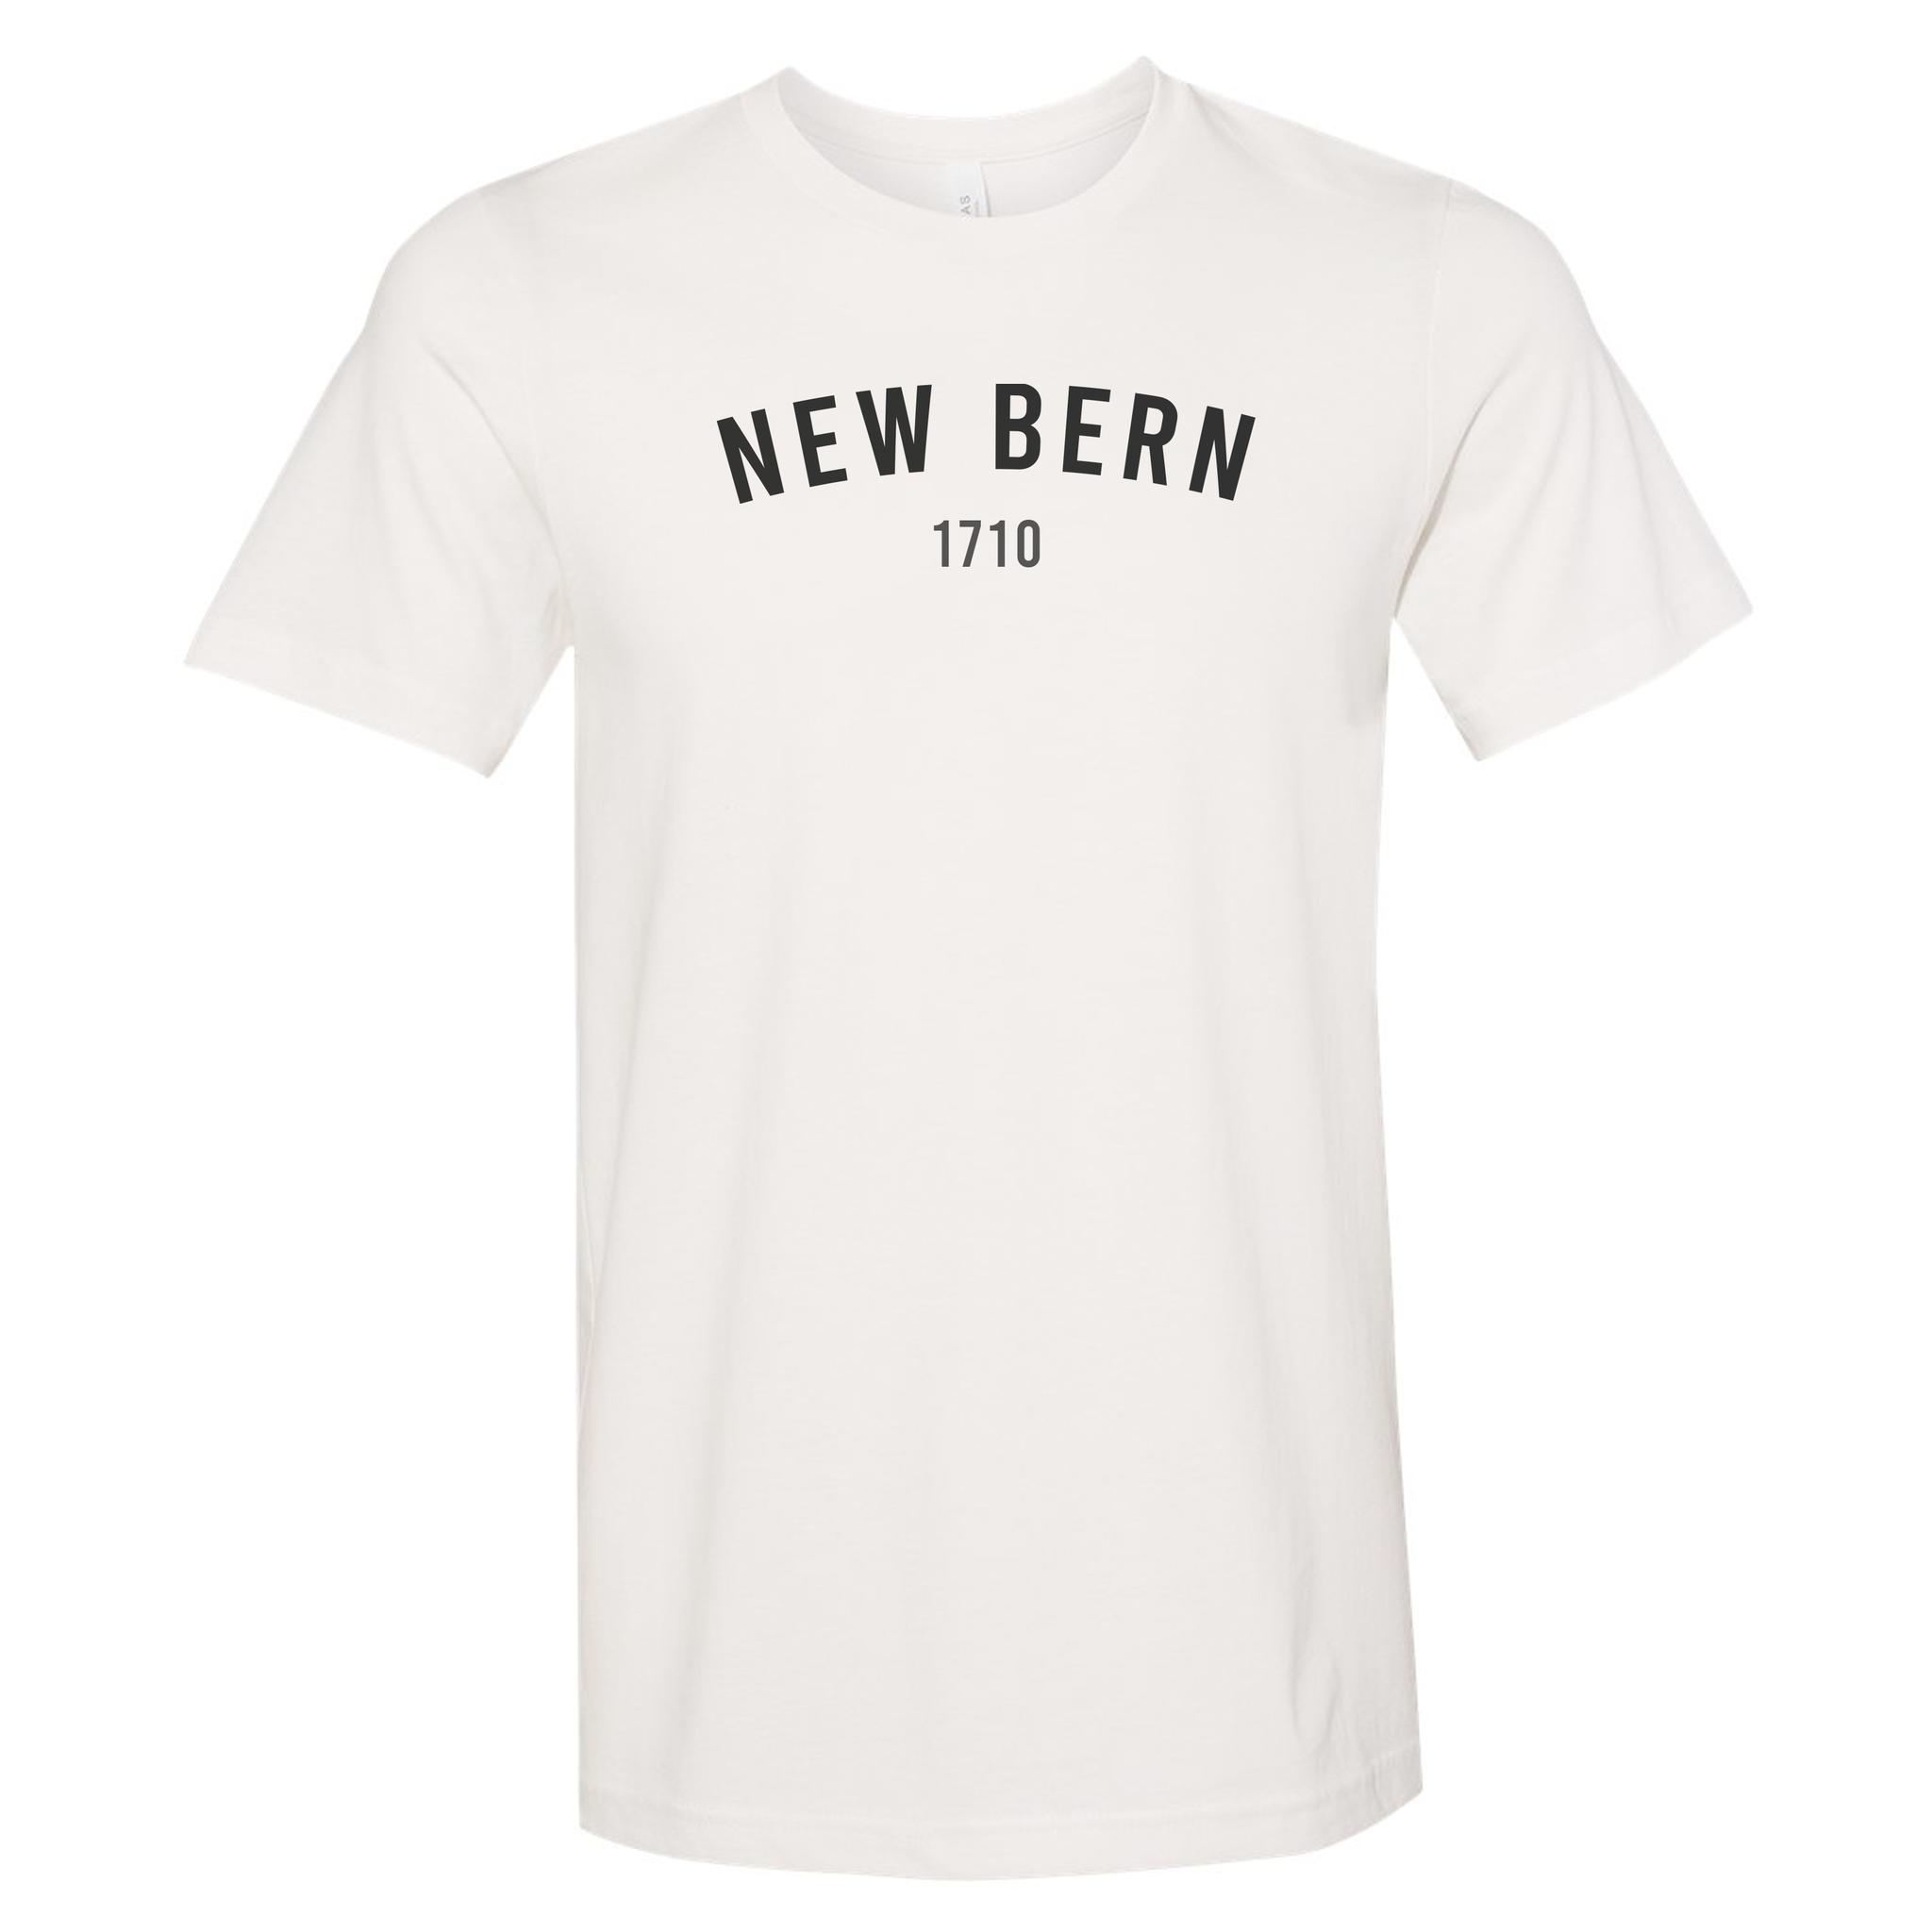 S.L. Revival Co. New Bern 1710 Shirt, S/S, Vintage White